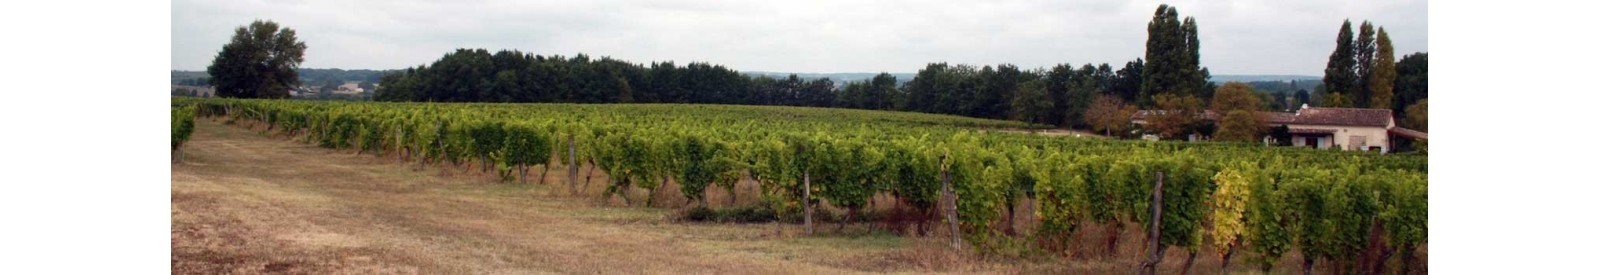 Château Haut-Fongrive - Bergerac - Organic wine | VIGNAPART